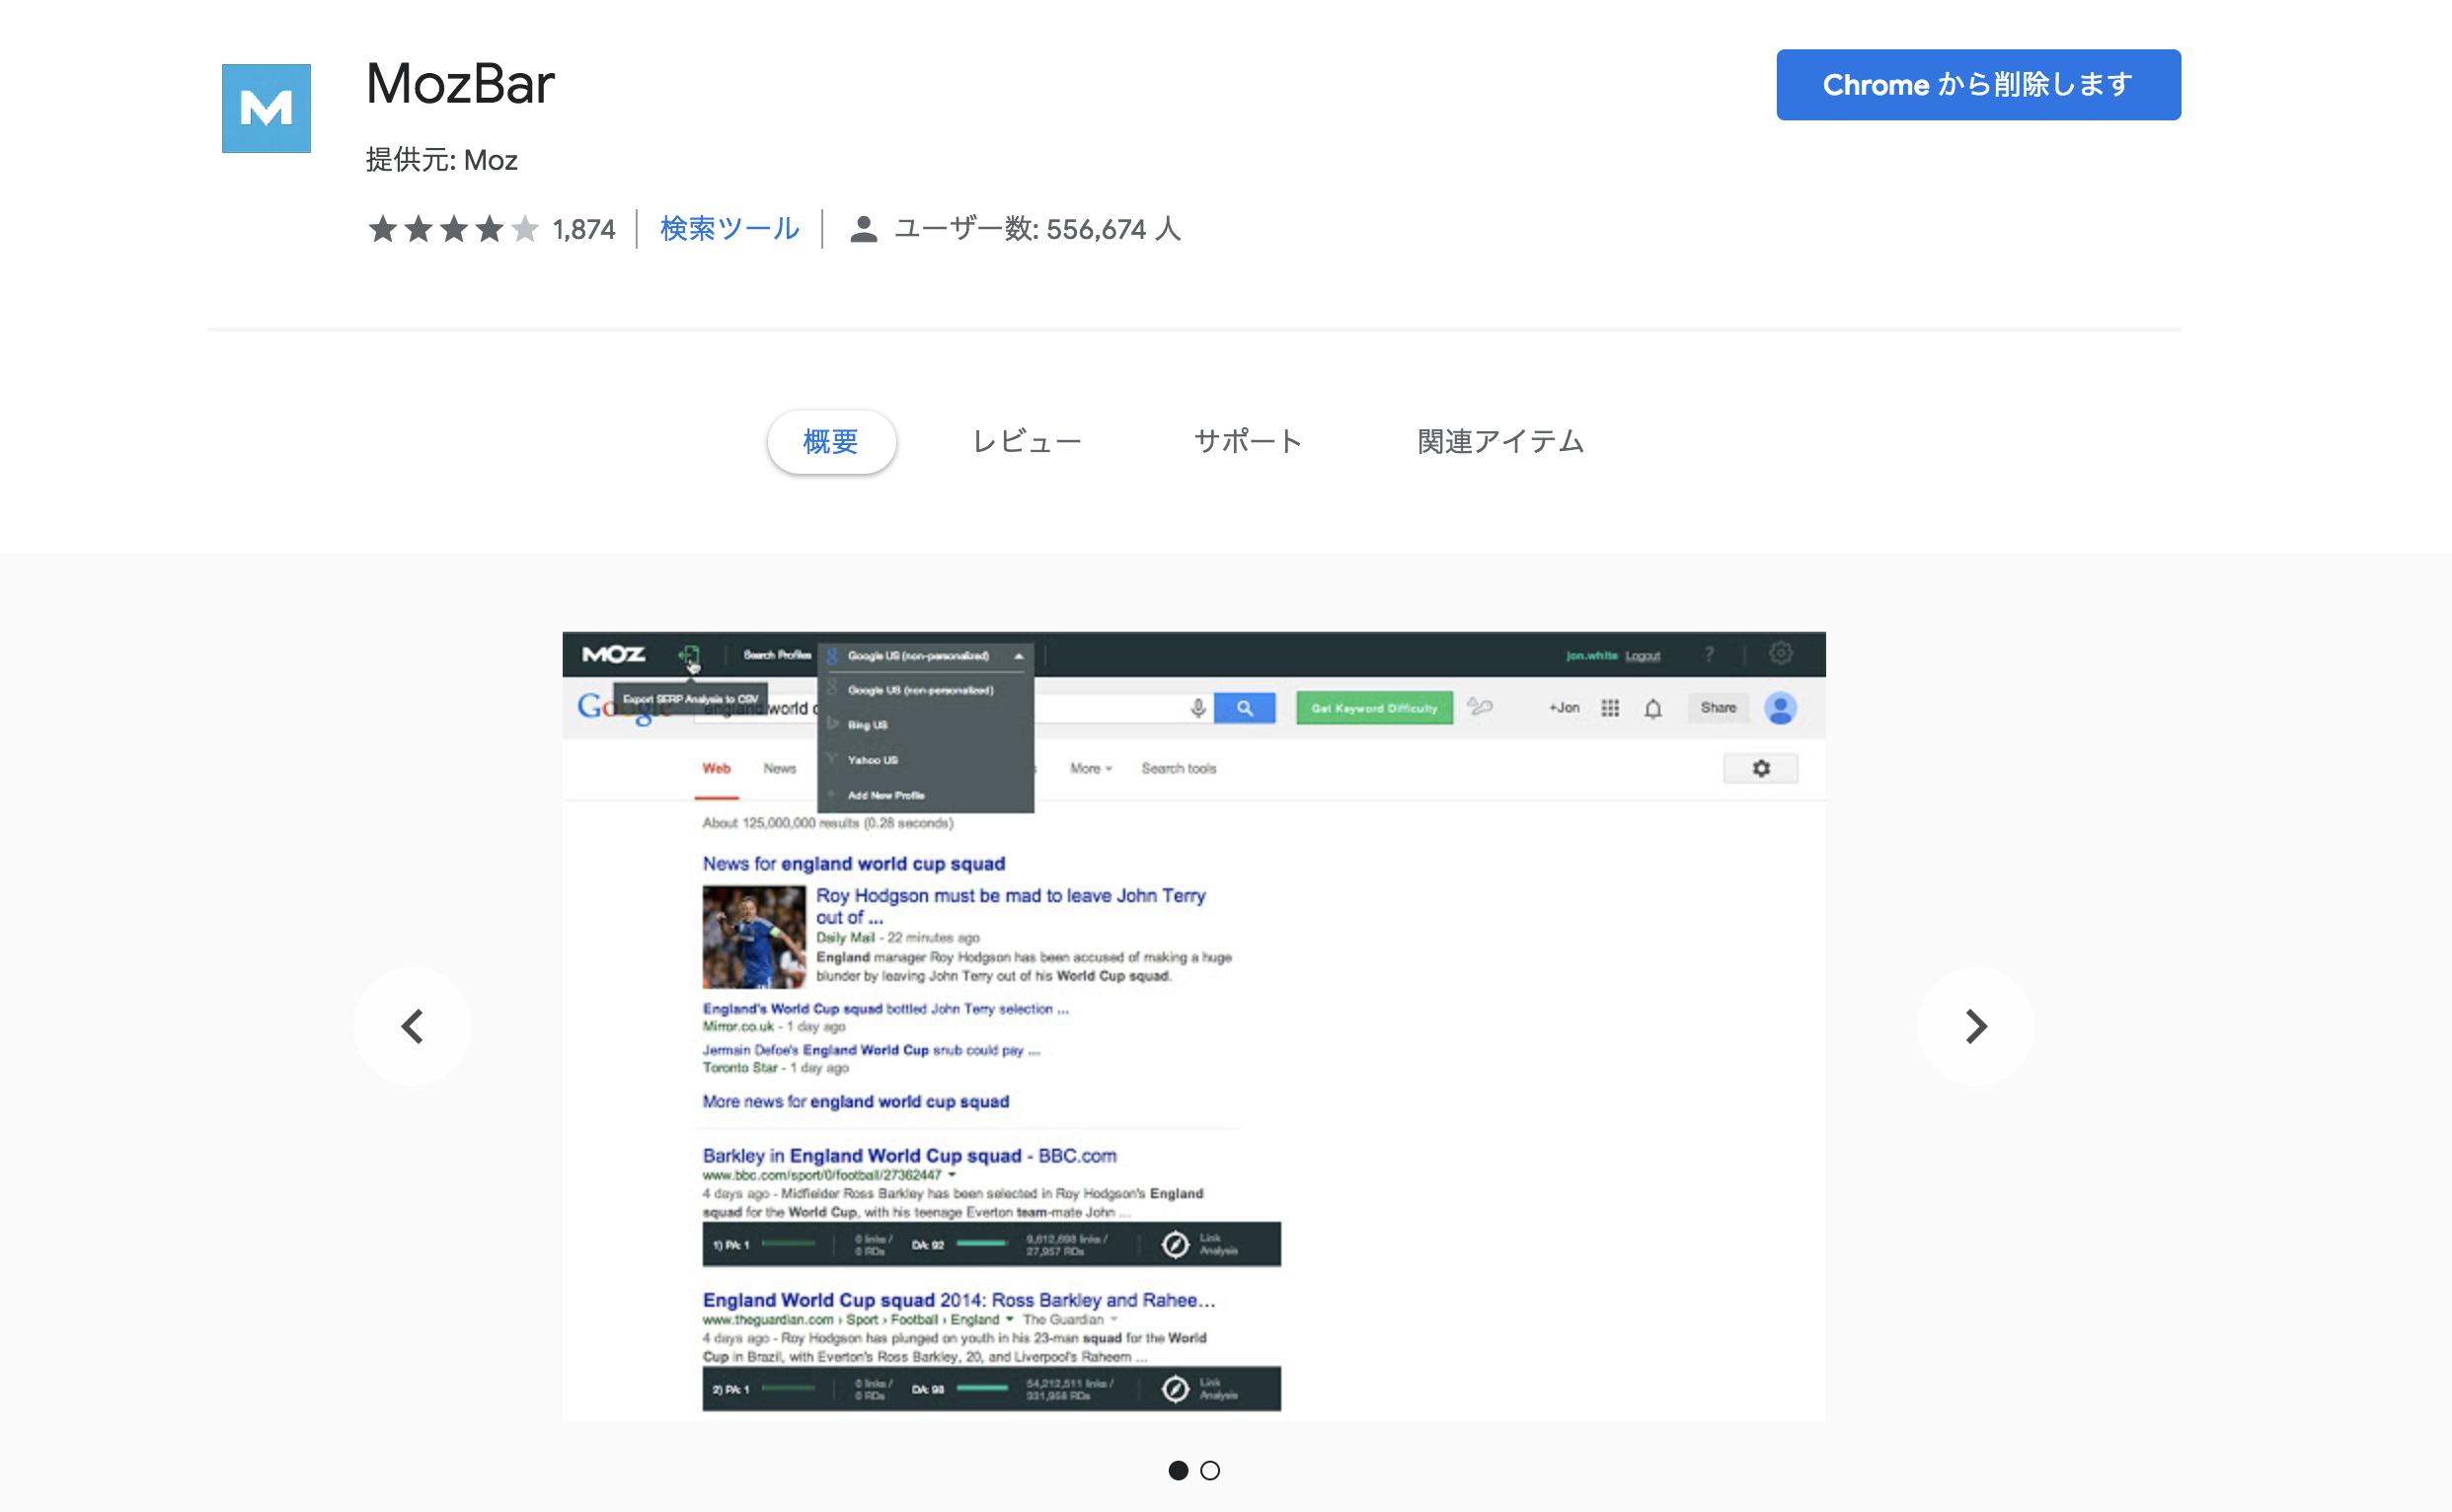 GoogleChrome(グーグルクローム) 拡張機能 MozBar